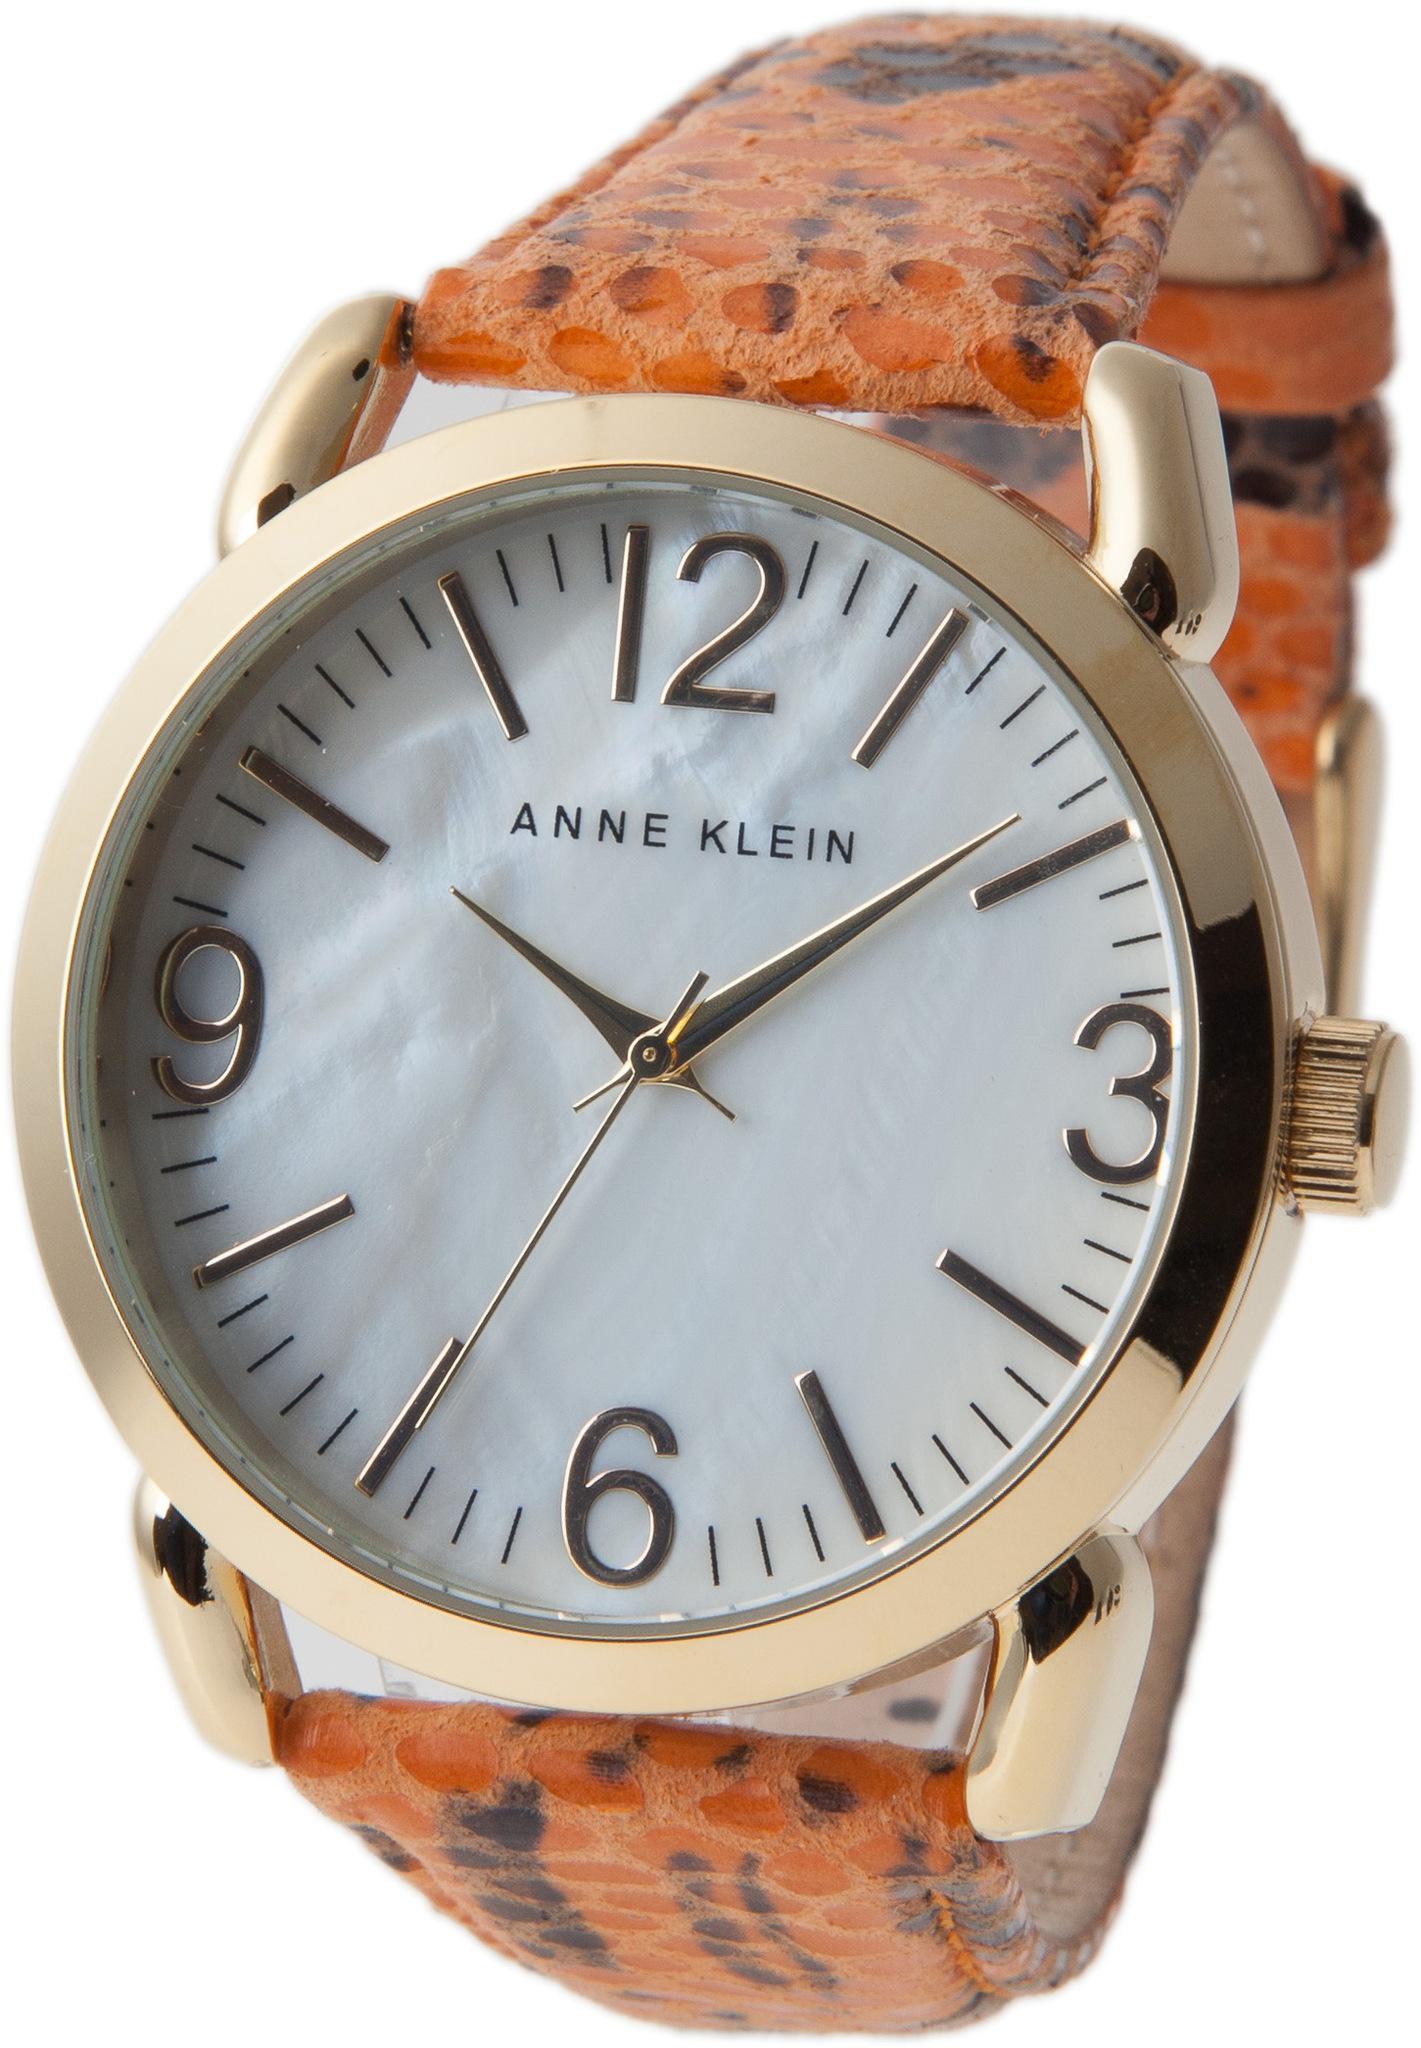 Anne Klein 1288MPOR - женские наручные часы из коллекции RingAnne Klein<br><br><br>Бренд: Anne Klein<br>Модель: Anne Klein 1288 MPOR<br>Артикул: 1288MPOR<br>Вариант артикула: None<br>Коллекция: Ring<br>Подколлекция: None<br>Страна: США<br>Пол: женские<br>Тип механизма: кварцевые<br>Механизм: None<br>Количество камней: None<br>Автоподзавод: None<br>Источник энергии: от батарейки<br>Срок службы элемента питания: None<br>Дисплей: стрелки<br>Цифры: арабские<br>Водозащита: None<br>Противоударные: None<br>Материал корпуса: латунь, покрытие: позолота (полное)<br>Материал браслета: кожа<br>Материал безеля: None<br>Стекло: минеральное<br>Антибликовое покрытие: None<br>Цвет корпуса: None<br>Цвет браслета: None<br>Цвет циферблата: None<br>Цвет безеля: None<br>Размеры: 40x10 мм<br>Диаметр: None<br>Диаметр корпуса: None<br>Толщина: None<br>Ширина ремешка: None<br>Вес: None<br>Спорт-функции: None<br>Подсветка: None<br>Вставка: None<br>Отображение даты: None<br>Хронограф: None<br>Таймер: None<br>Термометр: None<br>Хронометр: None<br>GPS: None<br>Радиосинхронизация: None<br>Барометр: None<br>Скелетон: None<br>Дополнительная информация: None<br>Дополнительные функции: None